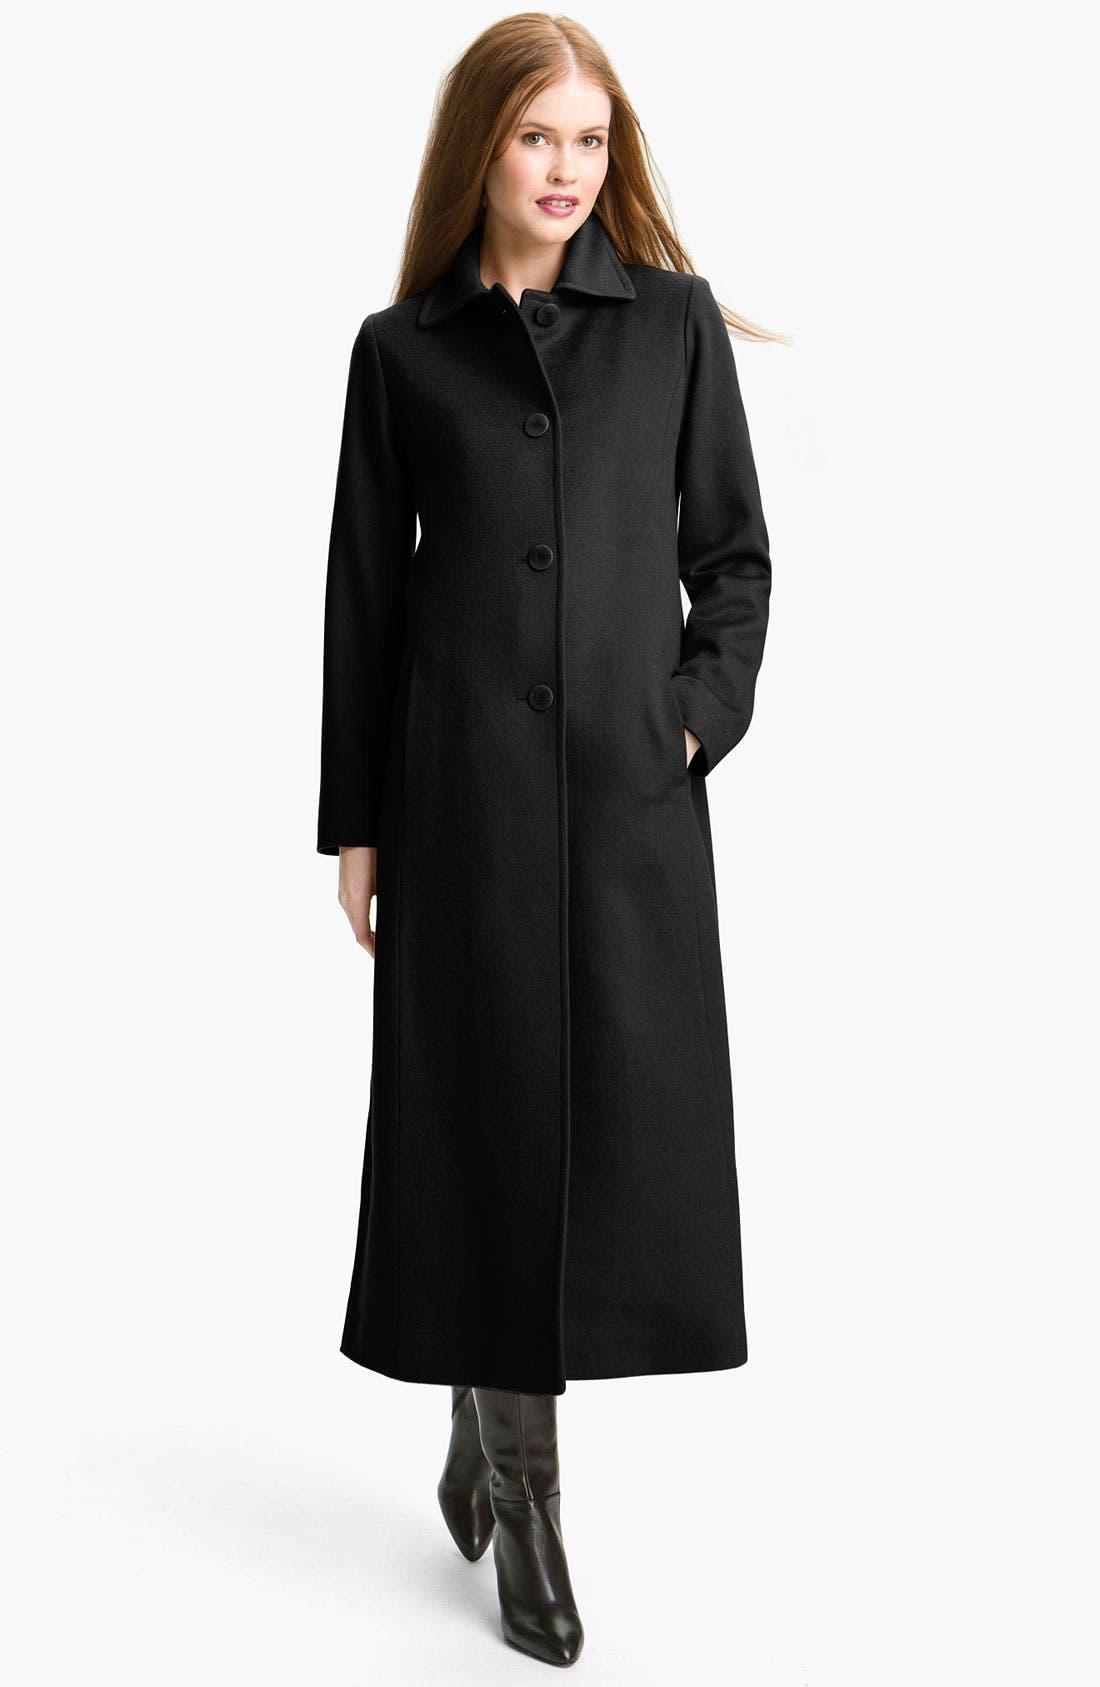 Alternate Image 1 Selected - Fleurette Single Breasted Cashmere Coat